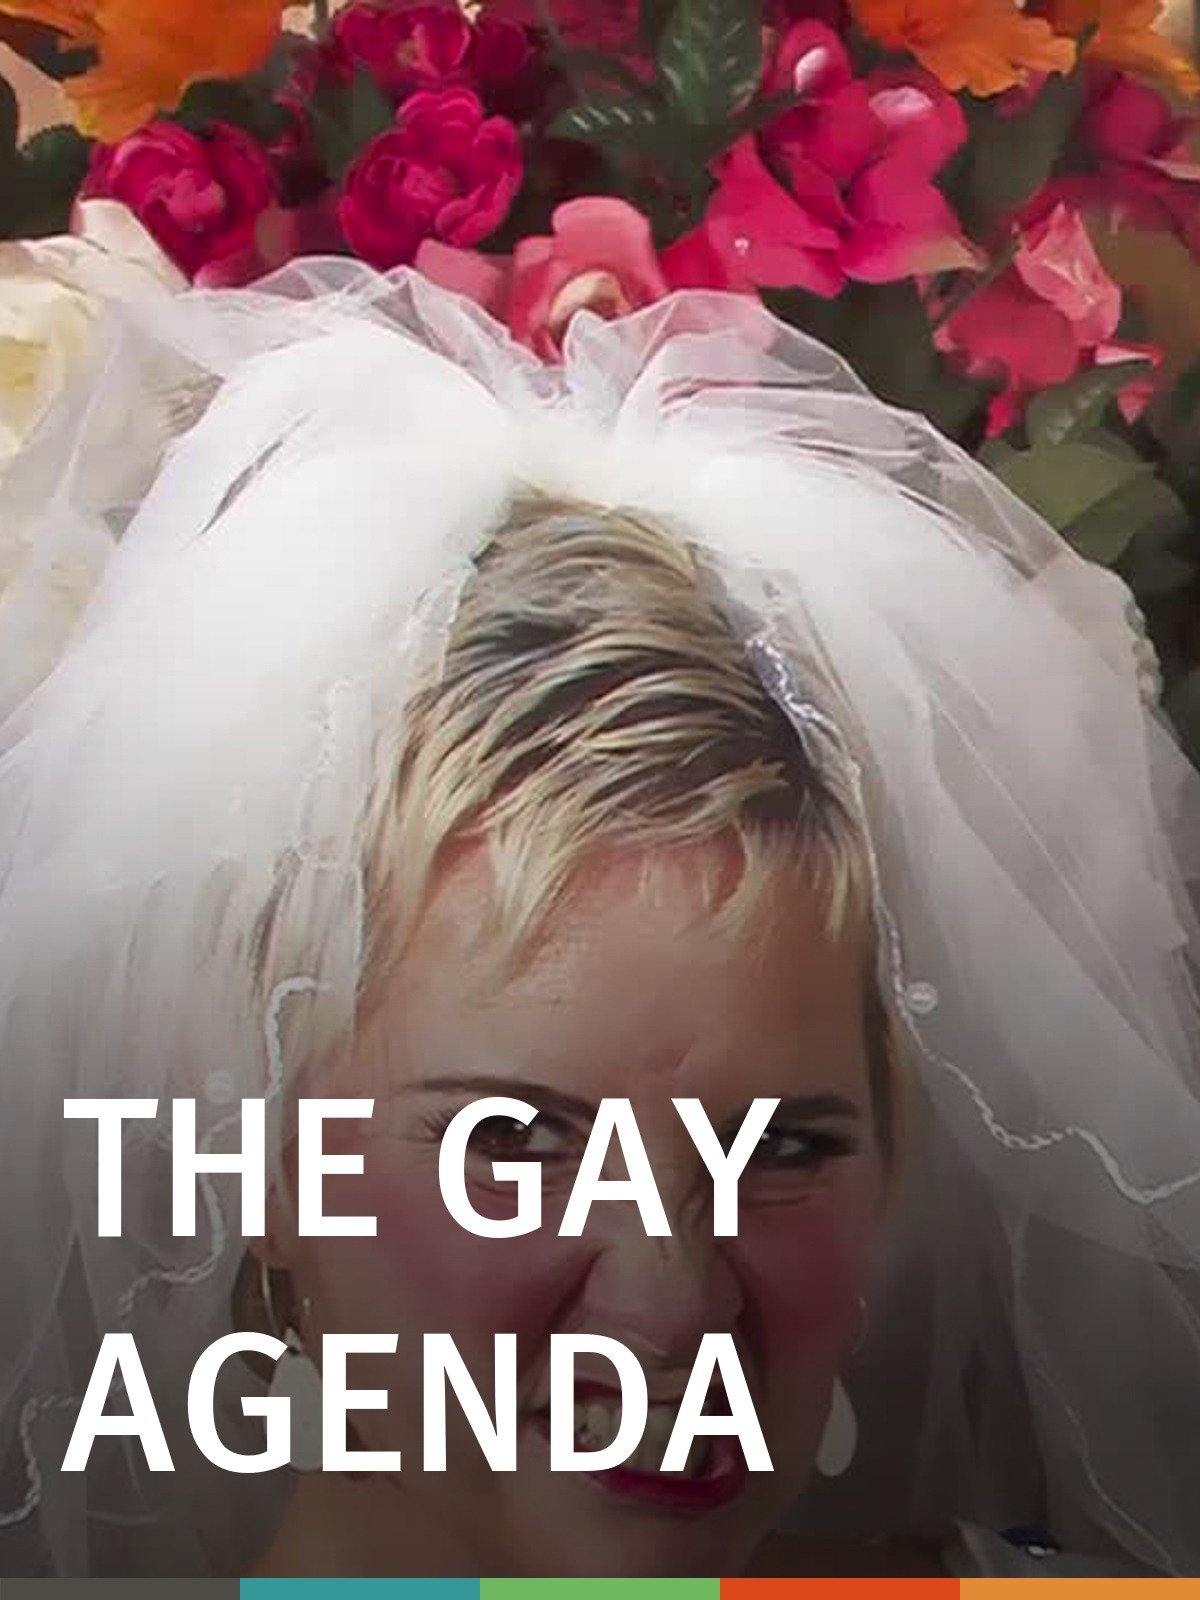 Amazon.com: Watch The Gay Agenda | Prime Video